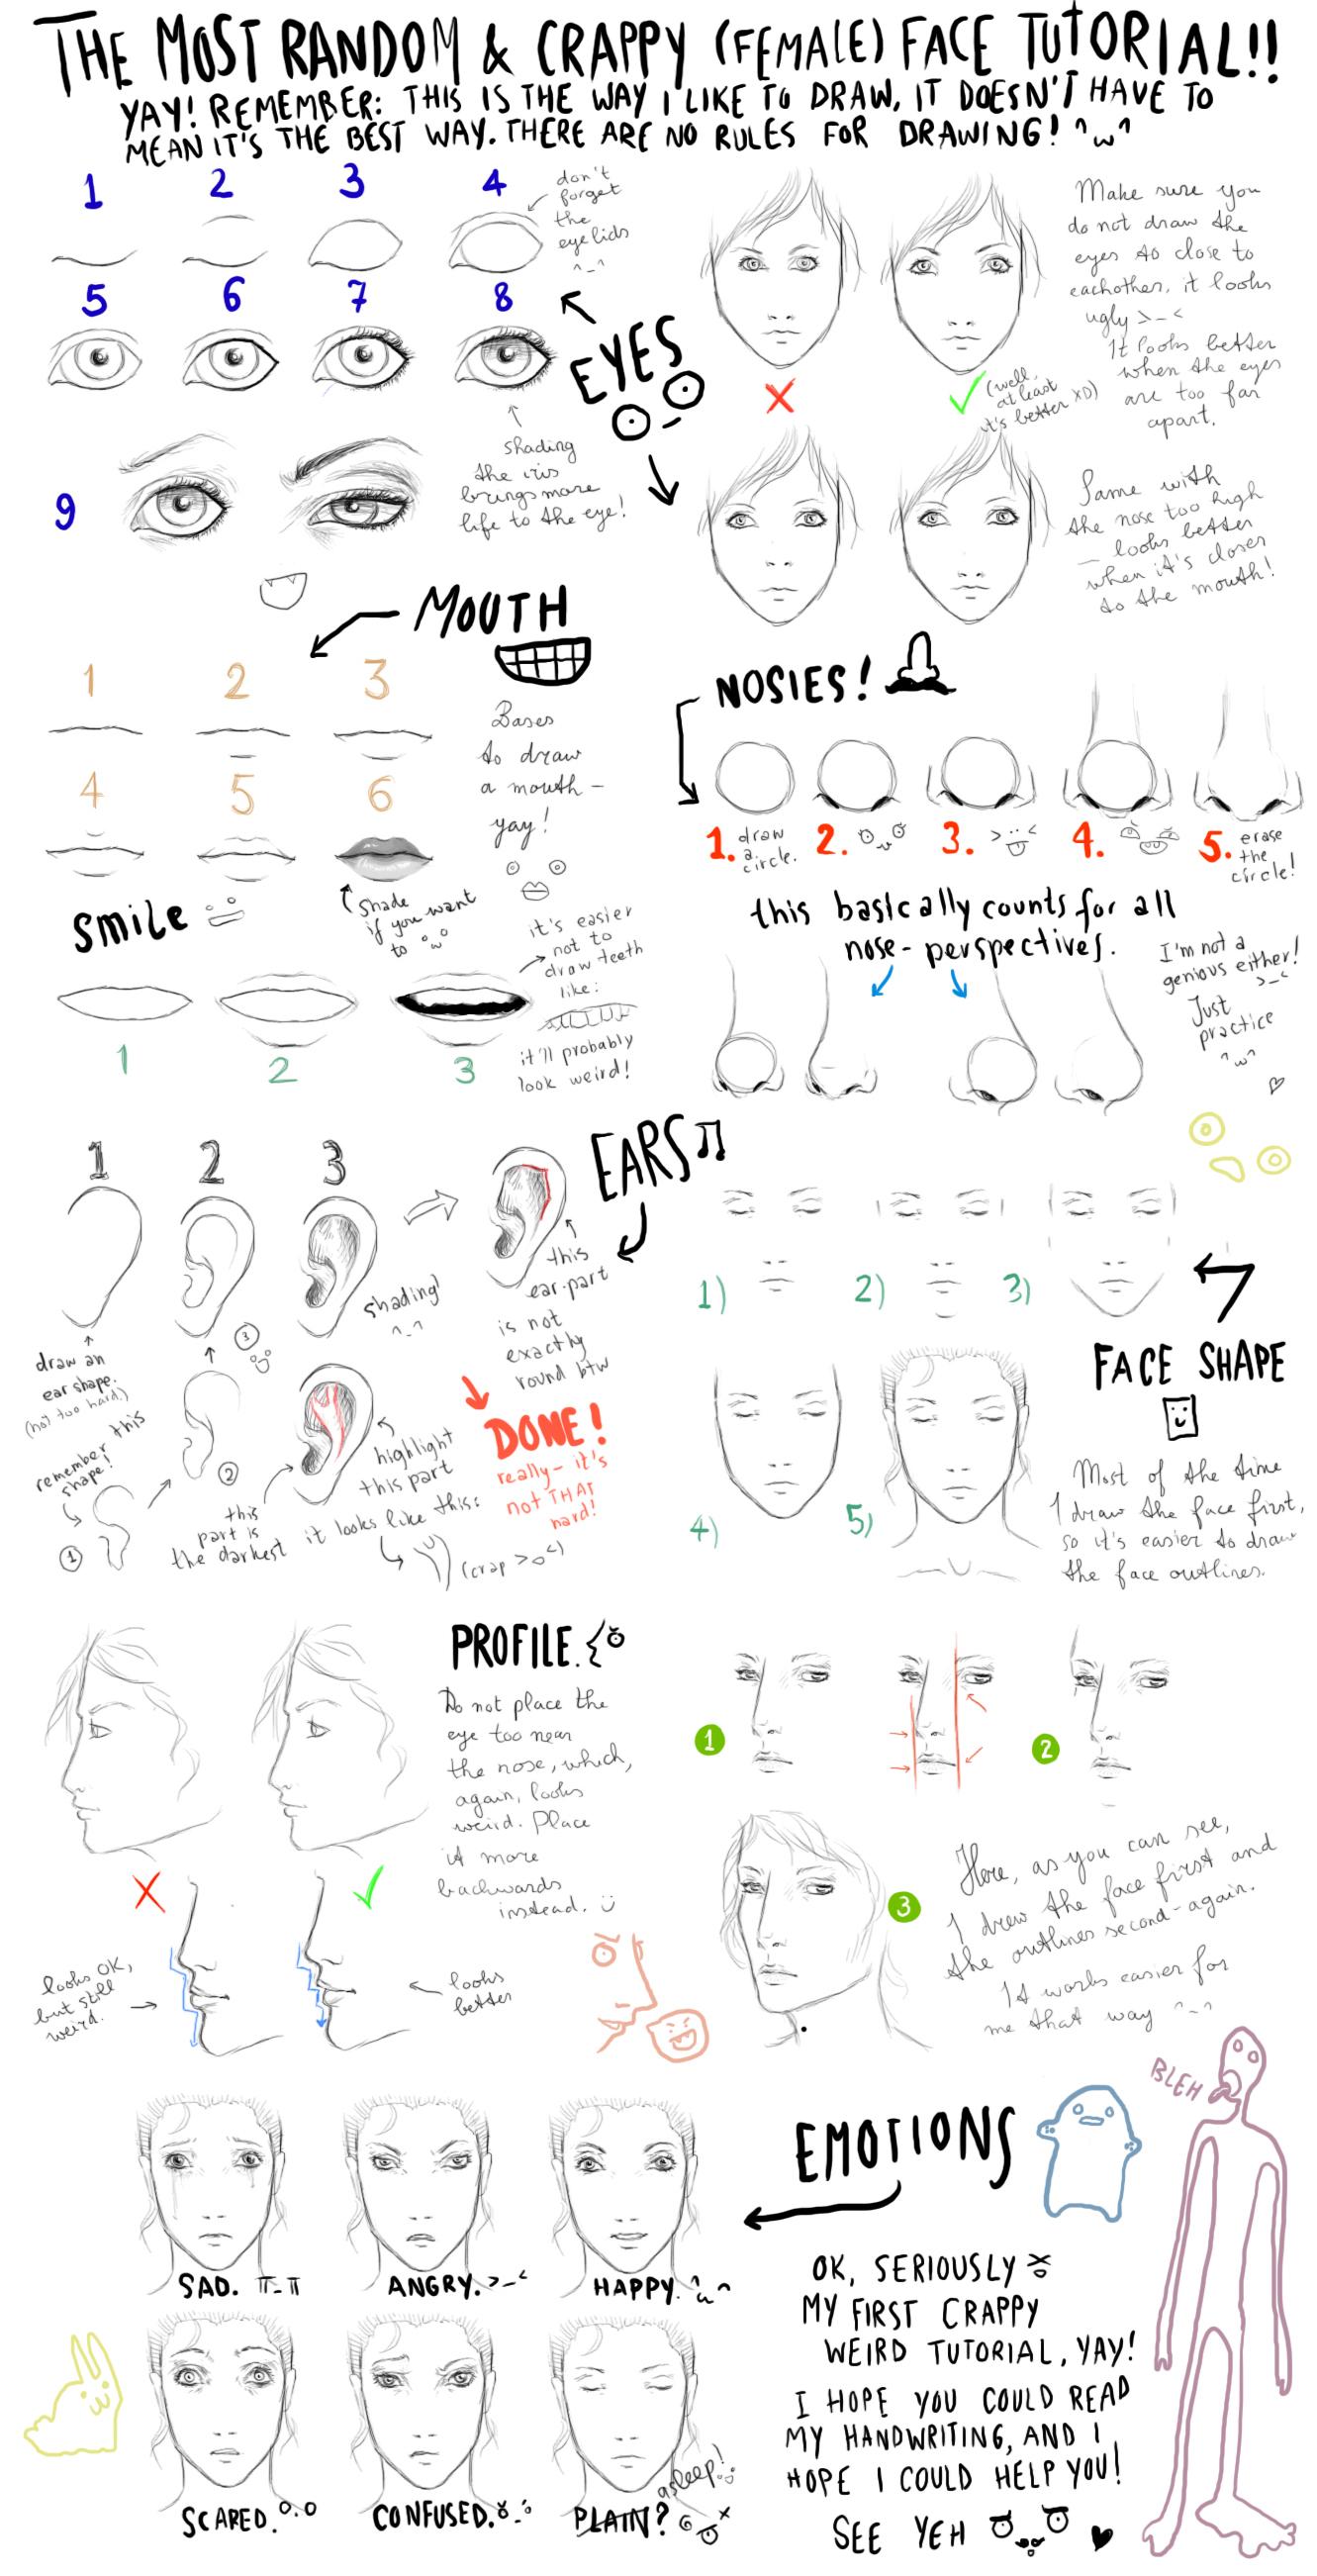 The most random face tutorial